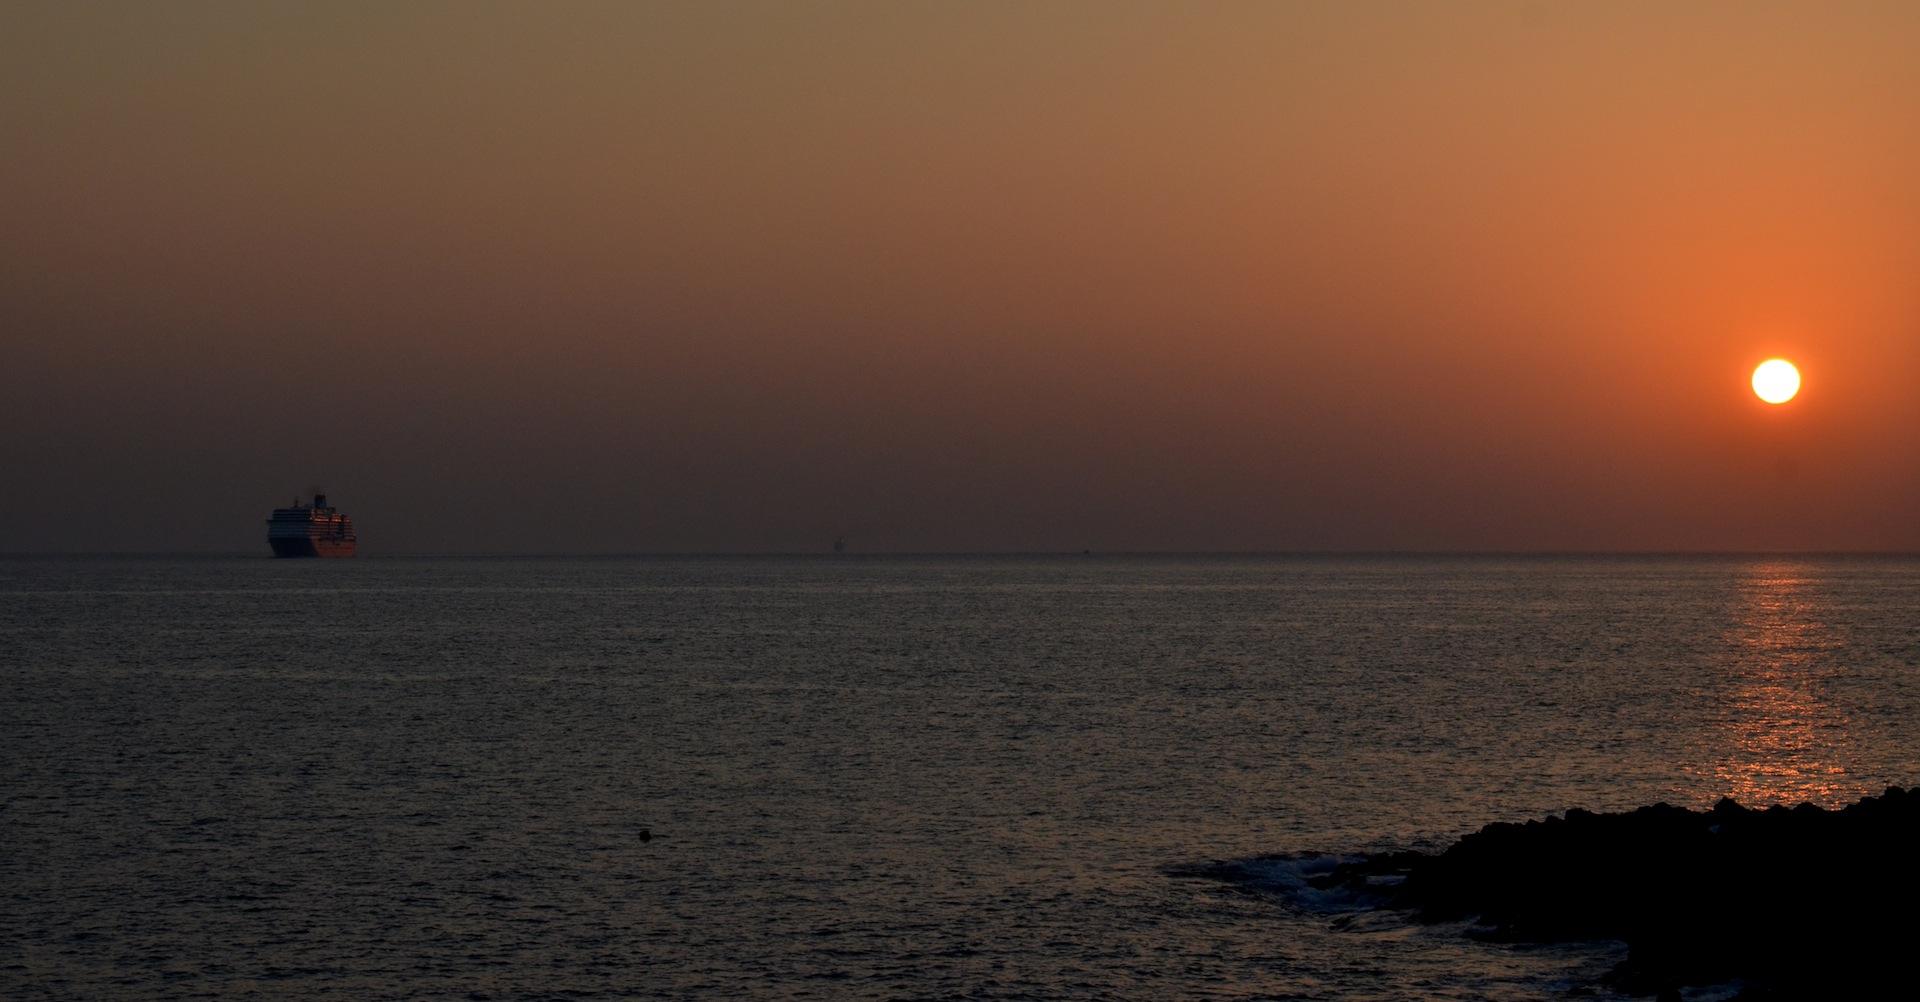 Noordam & Aegean Odyssey